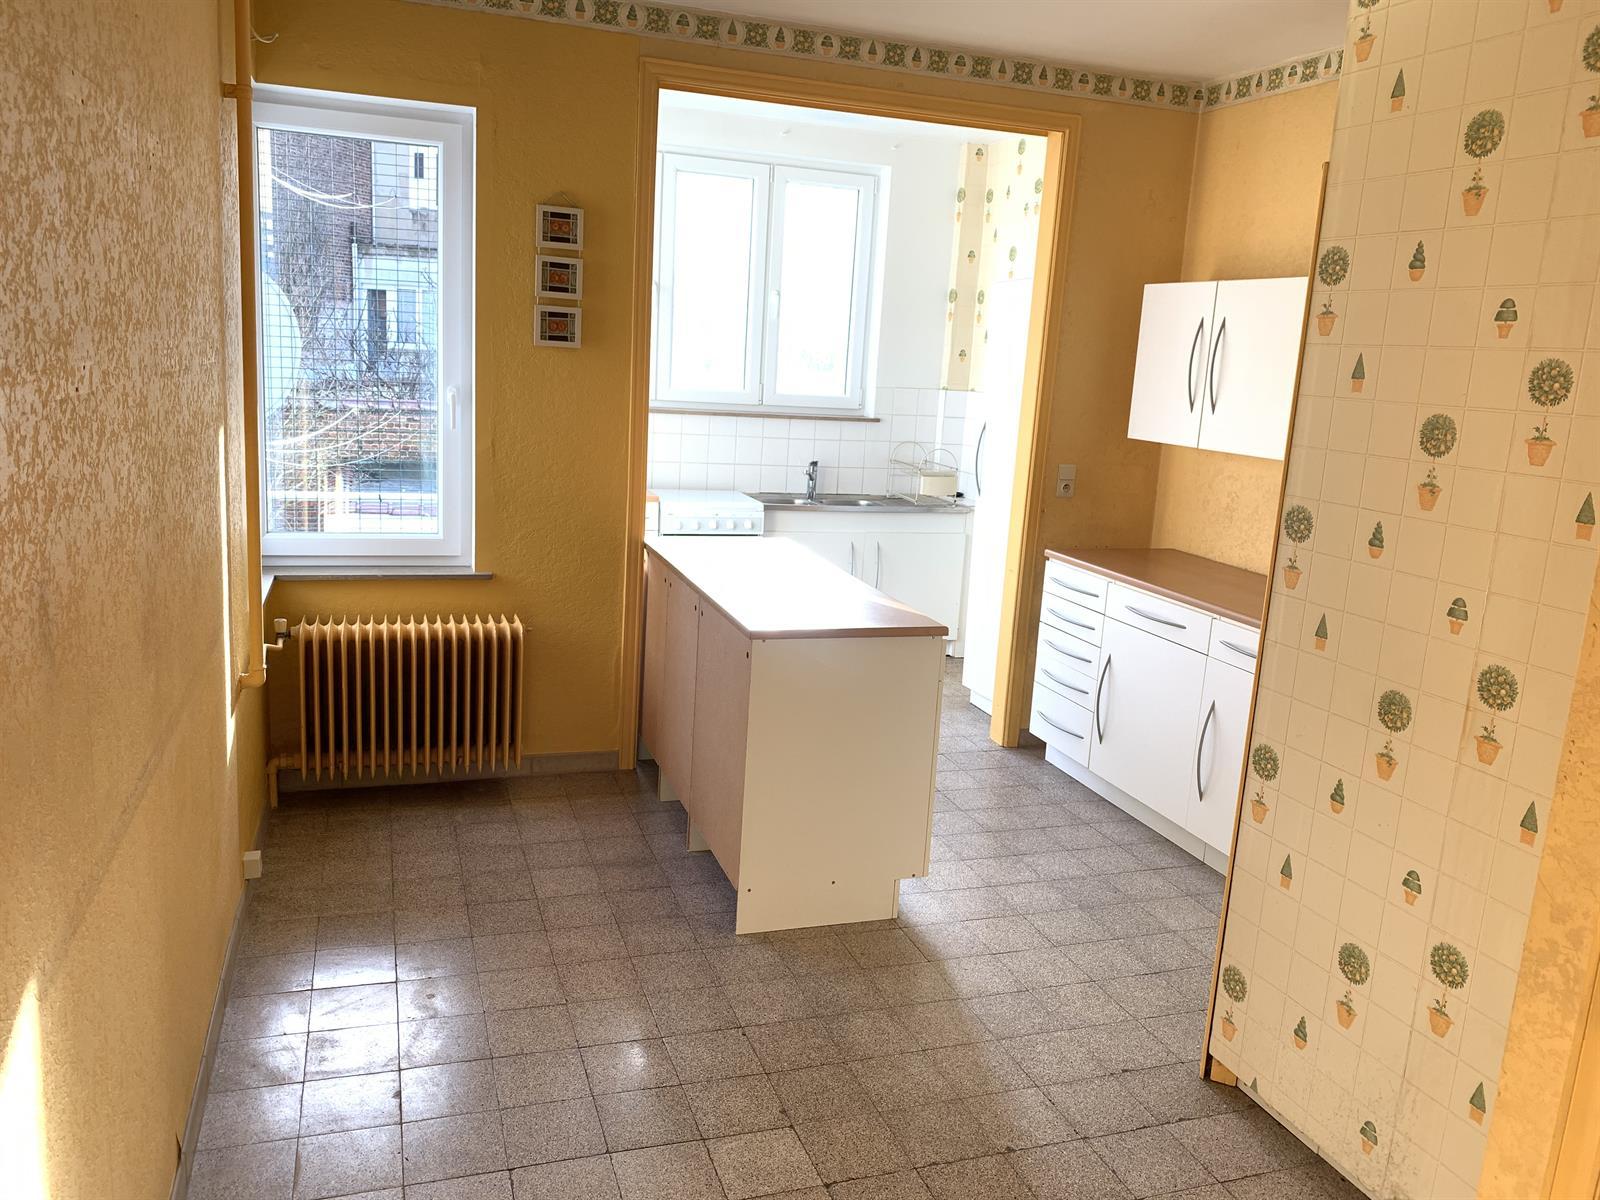 Flat - Molenbeek-Saint-Jean - #3956375-18